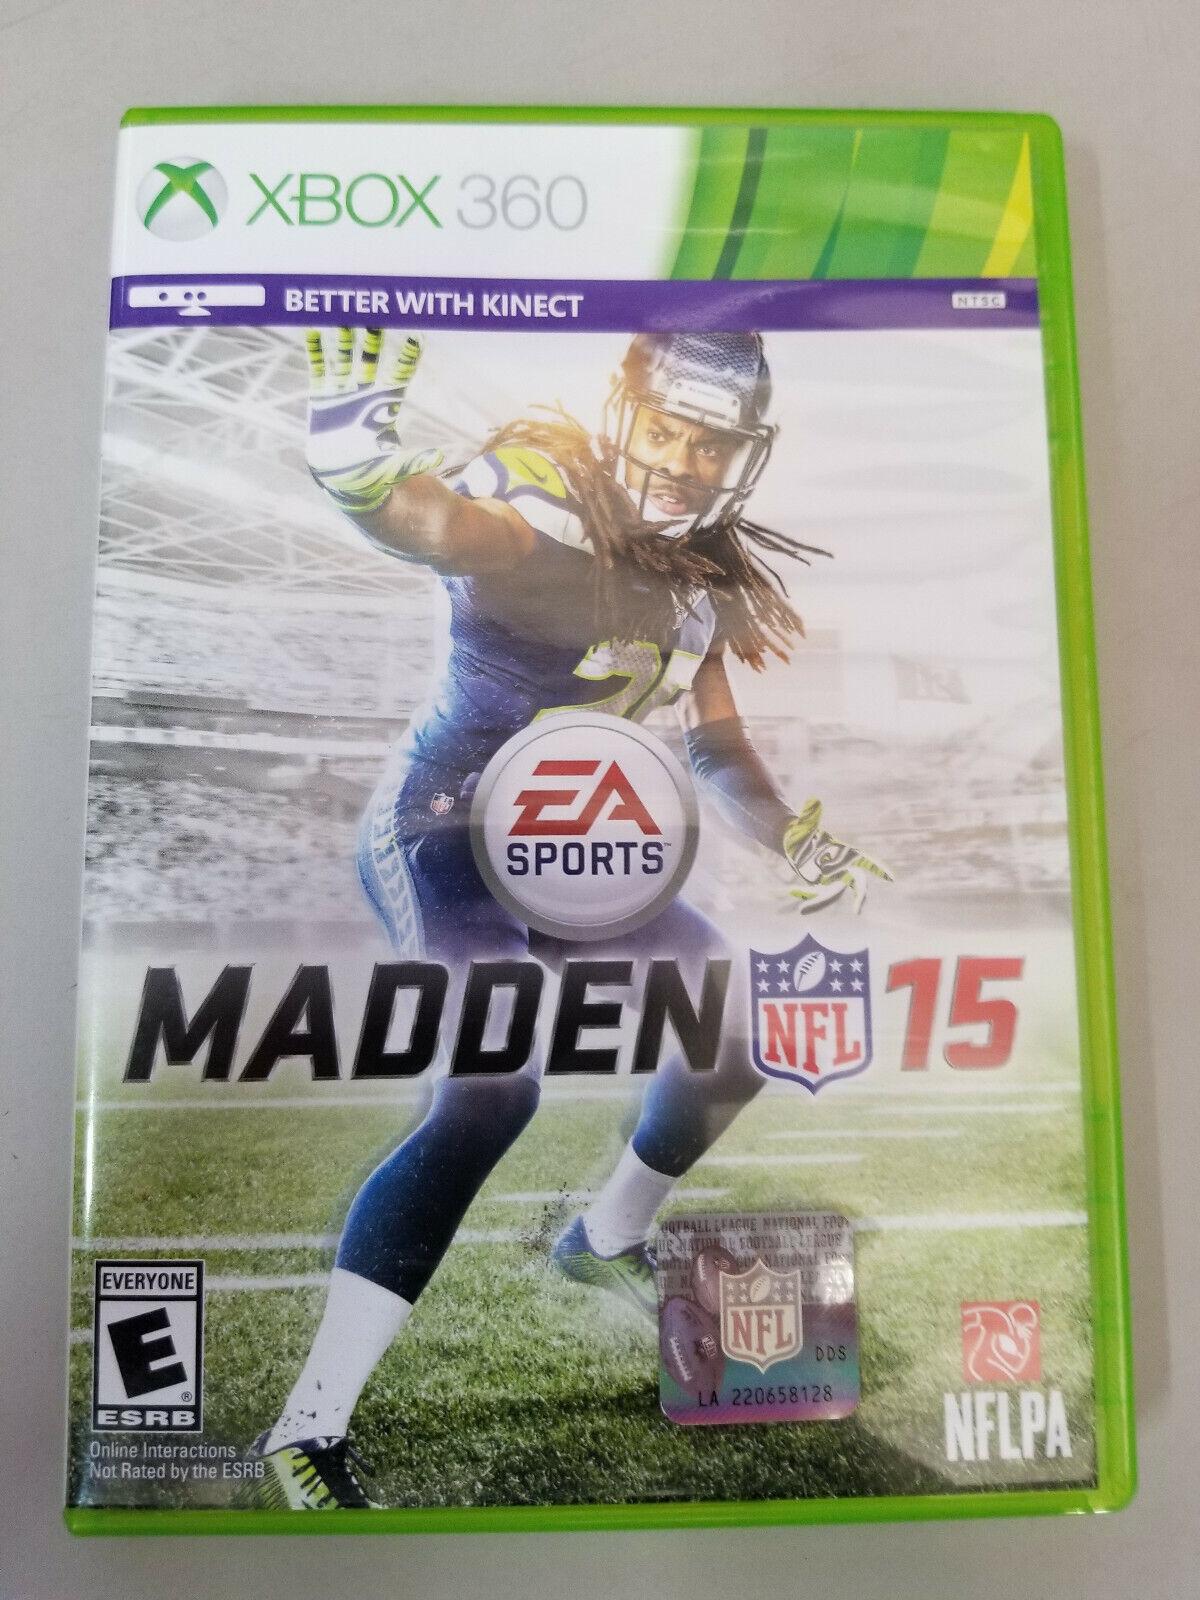 Madden NFL 15 Microsoft Xbox 360, 2014 Tested, No Manual - $8.00